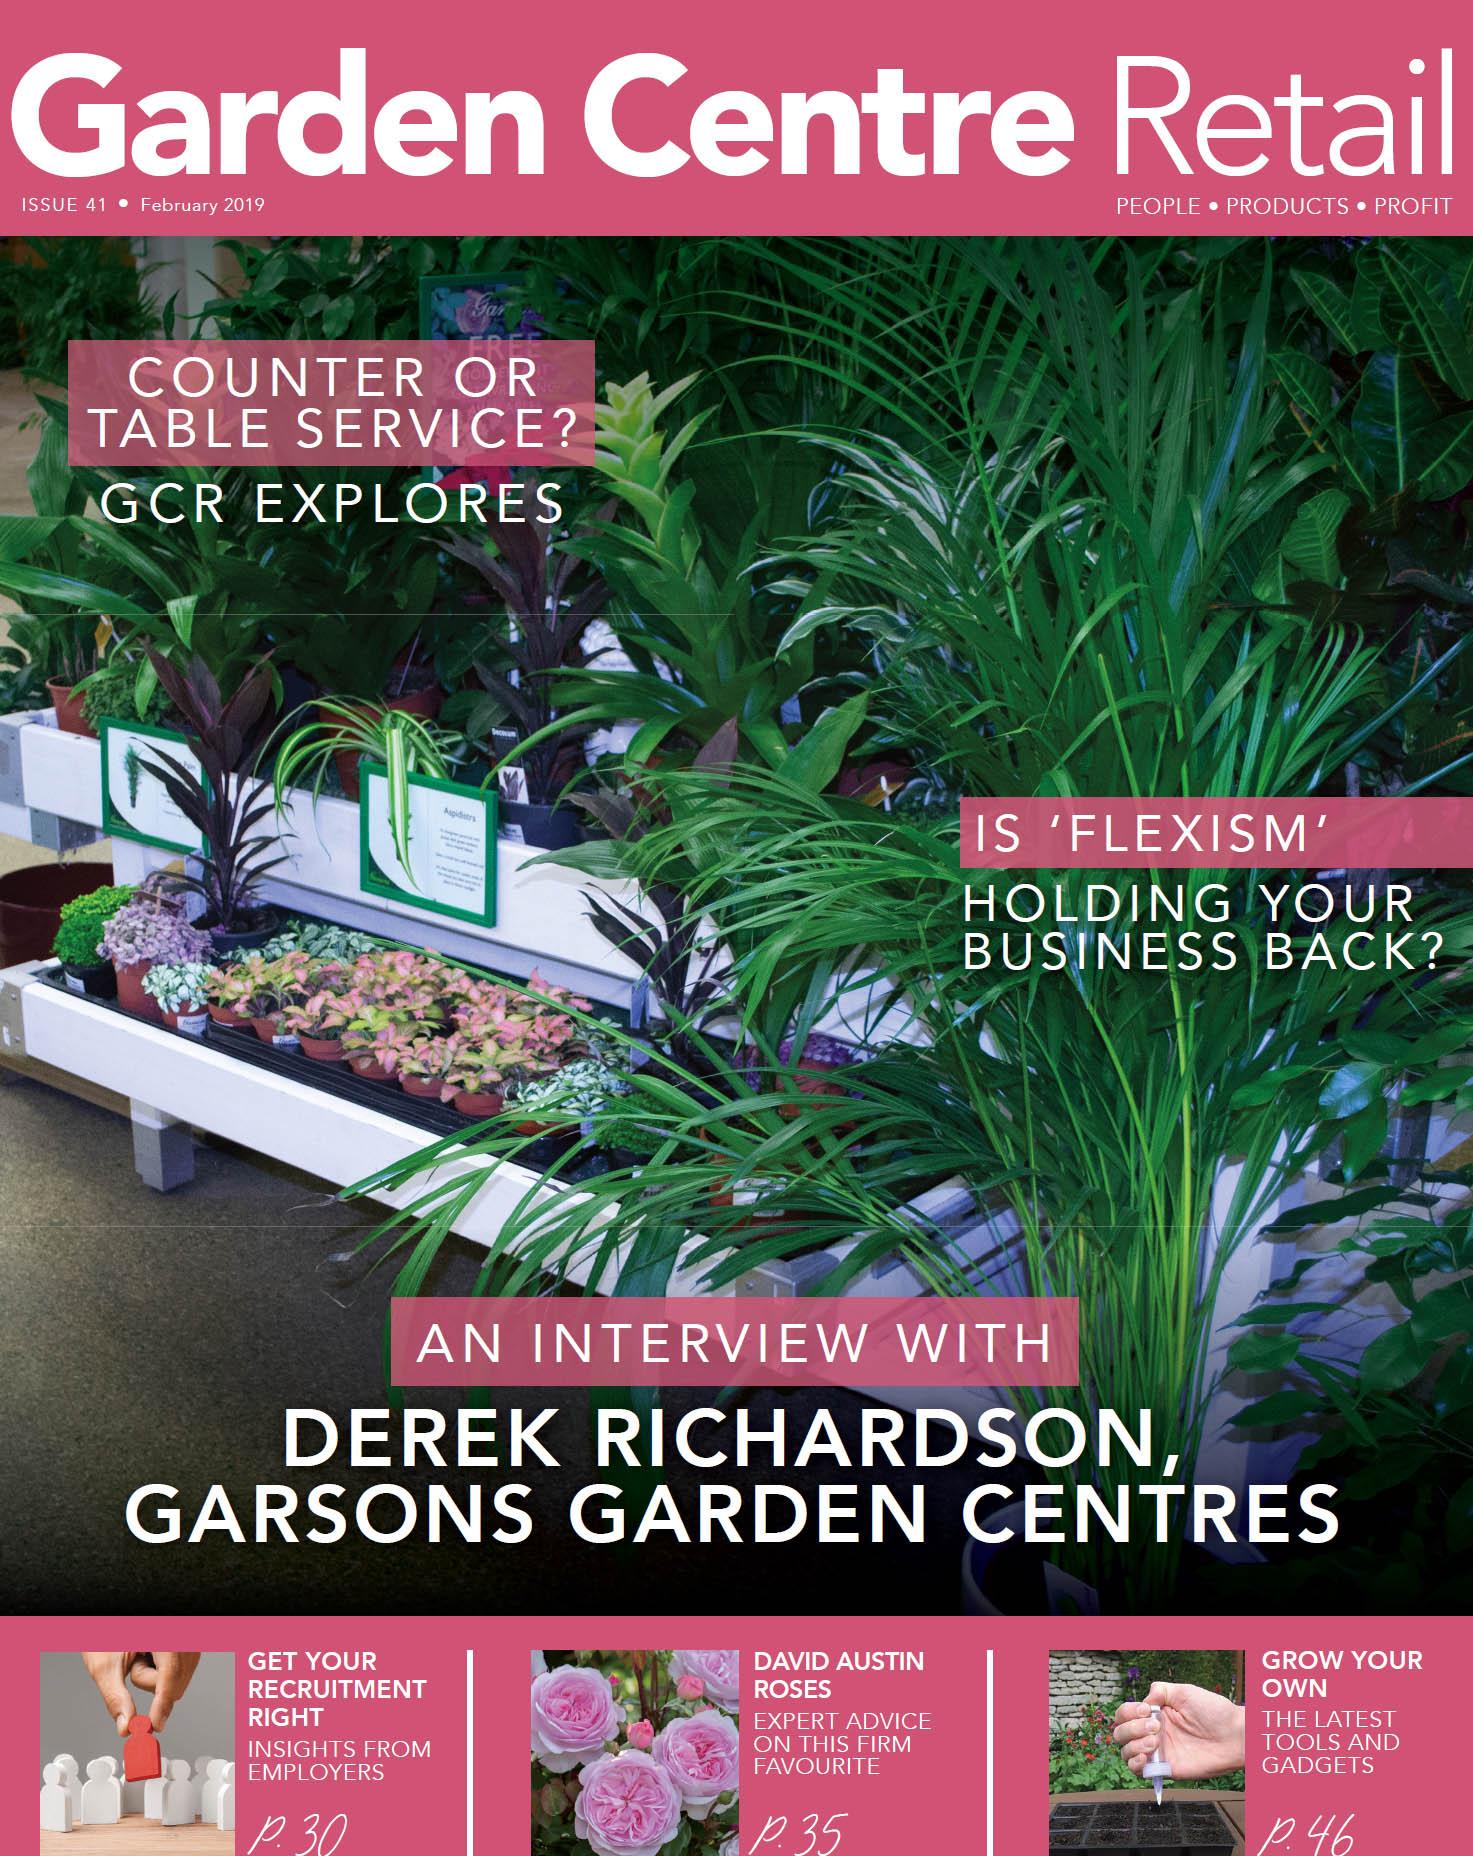 Garden Centre Retail February 2019